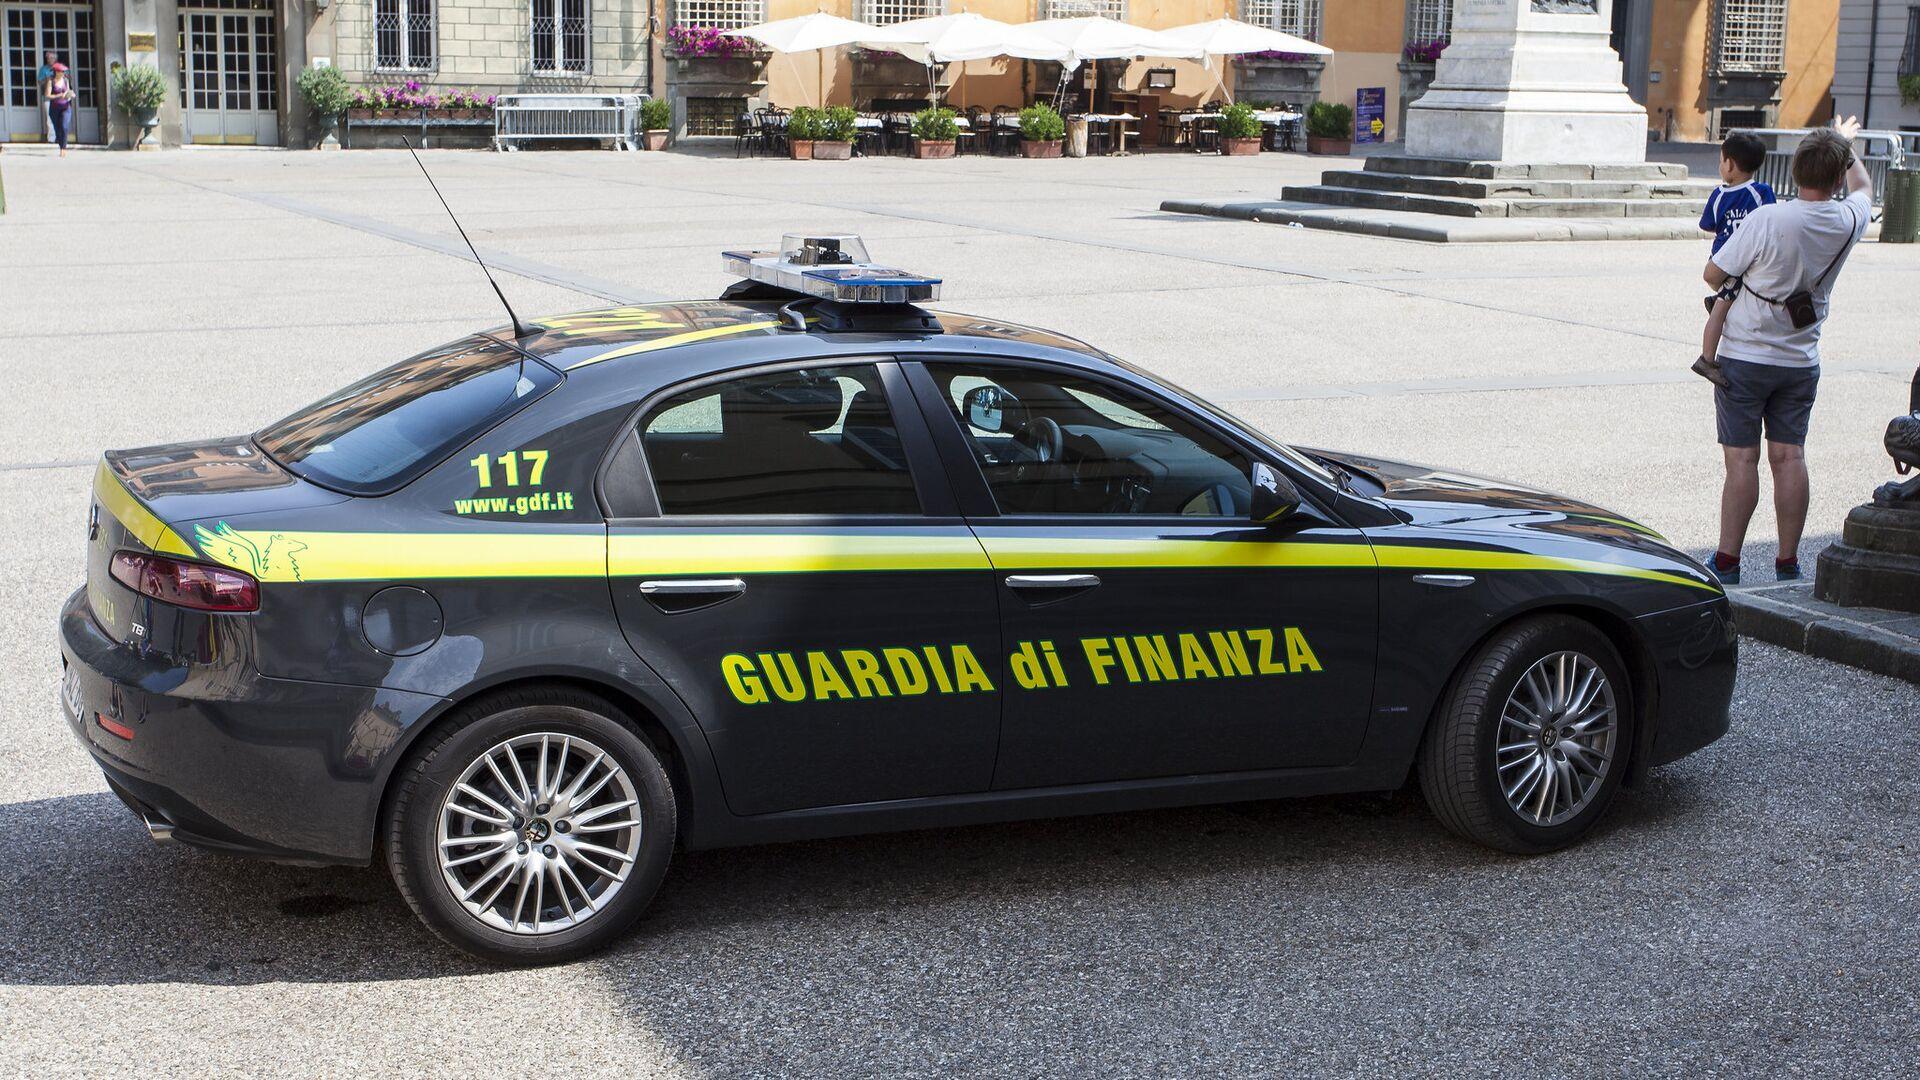 Guardia di Finanza - Sputnik Italia, 1920, 14.06.2021